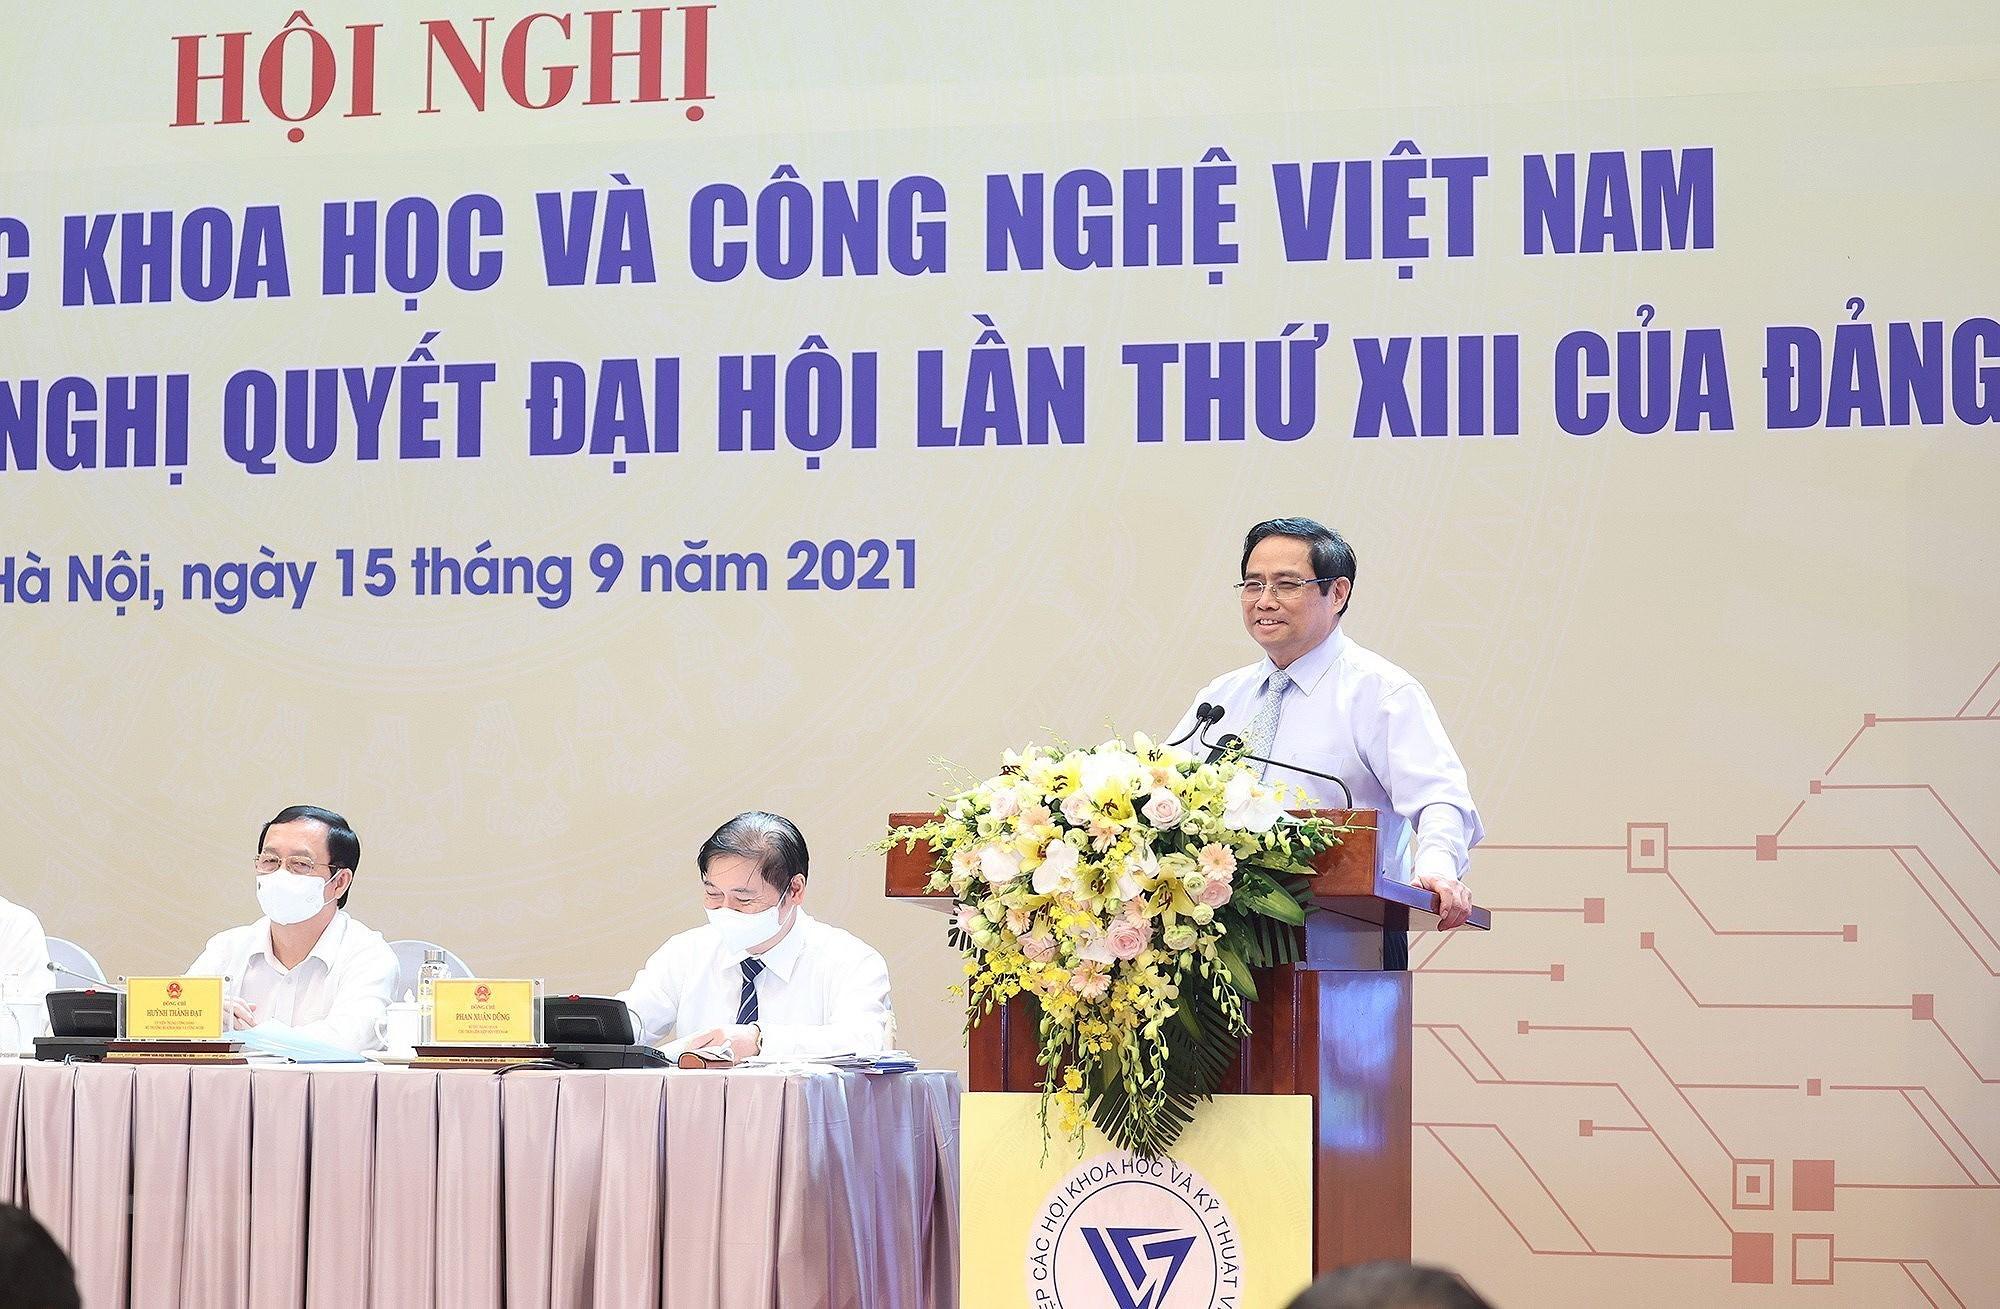 Thu tuong du Hoi nghi doi ngu tri thuc khoa hoc va cong nghe Viet Nam hinh anh 1